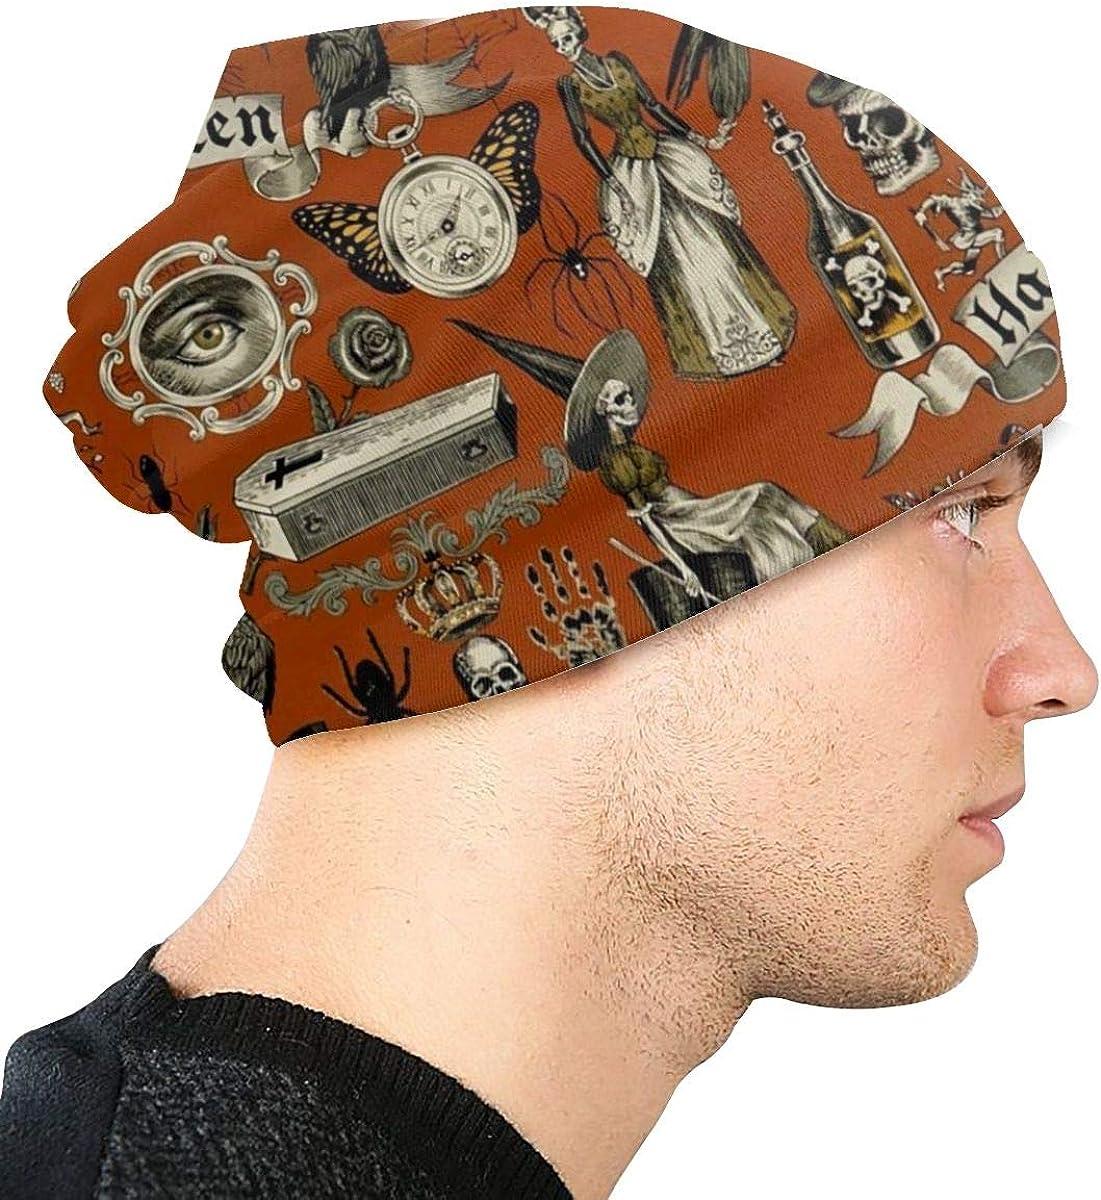 Happy Halloween Sugar Skull Vintage Slouchy Beanie Hats for Women Men Bonnet Cap Warm Casual Skull Knit Hat Caps Black